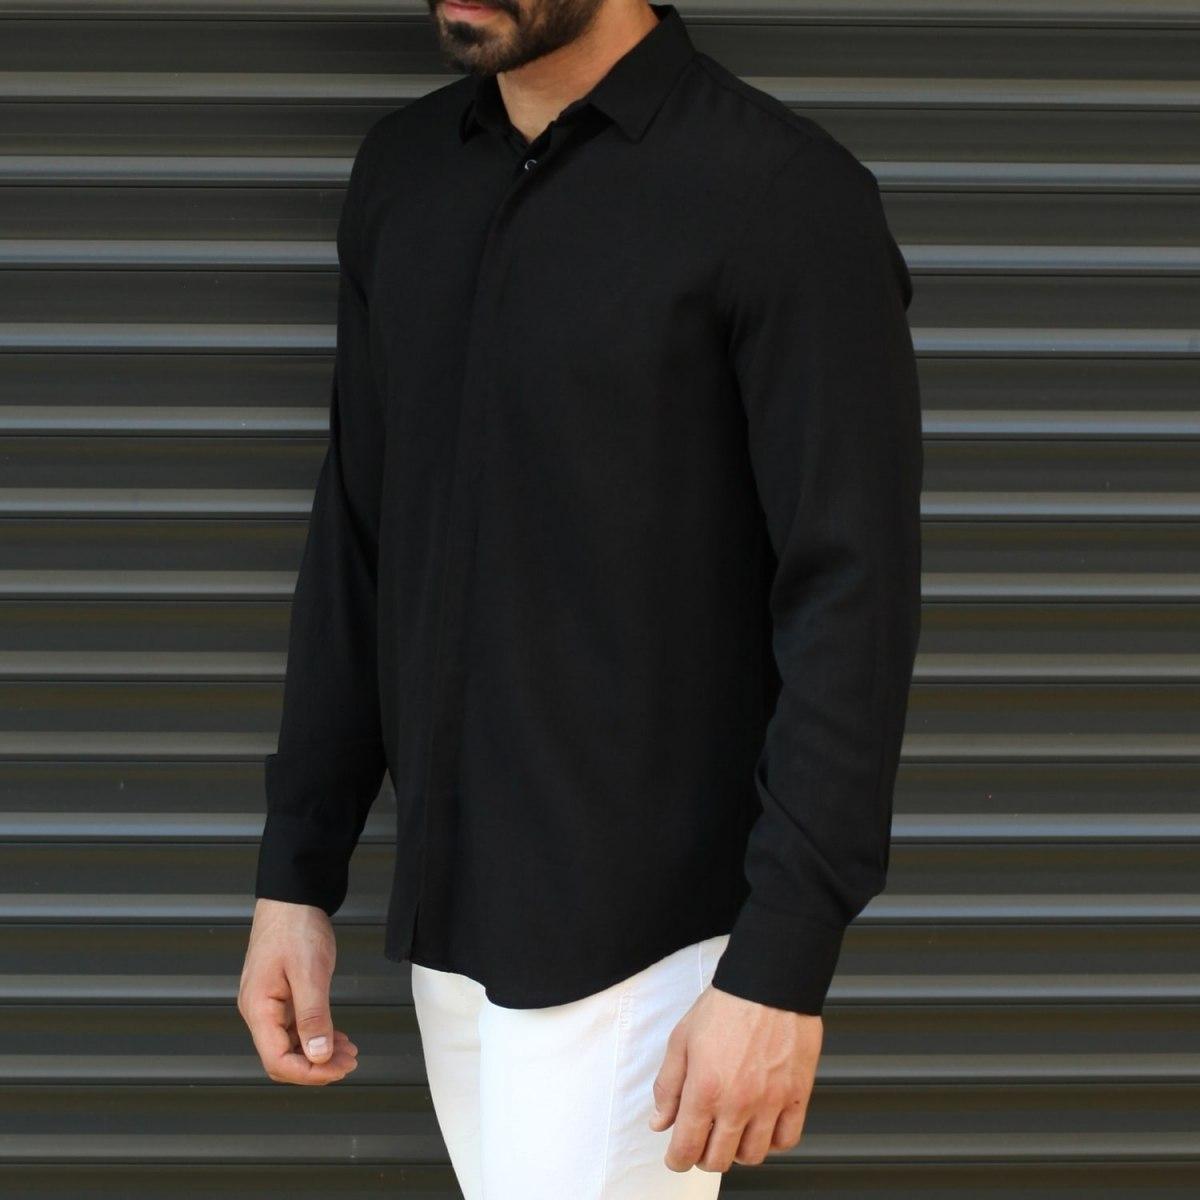 Men's Basic Stylish Casual Shirt In Solid Black Mv Premium Brand - 2